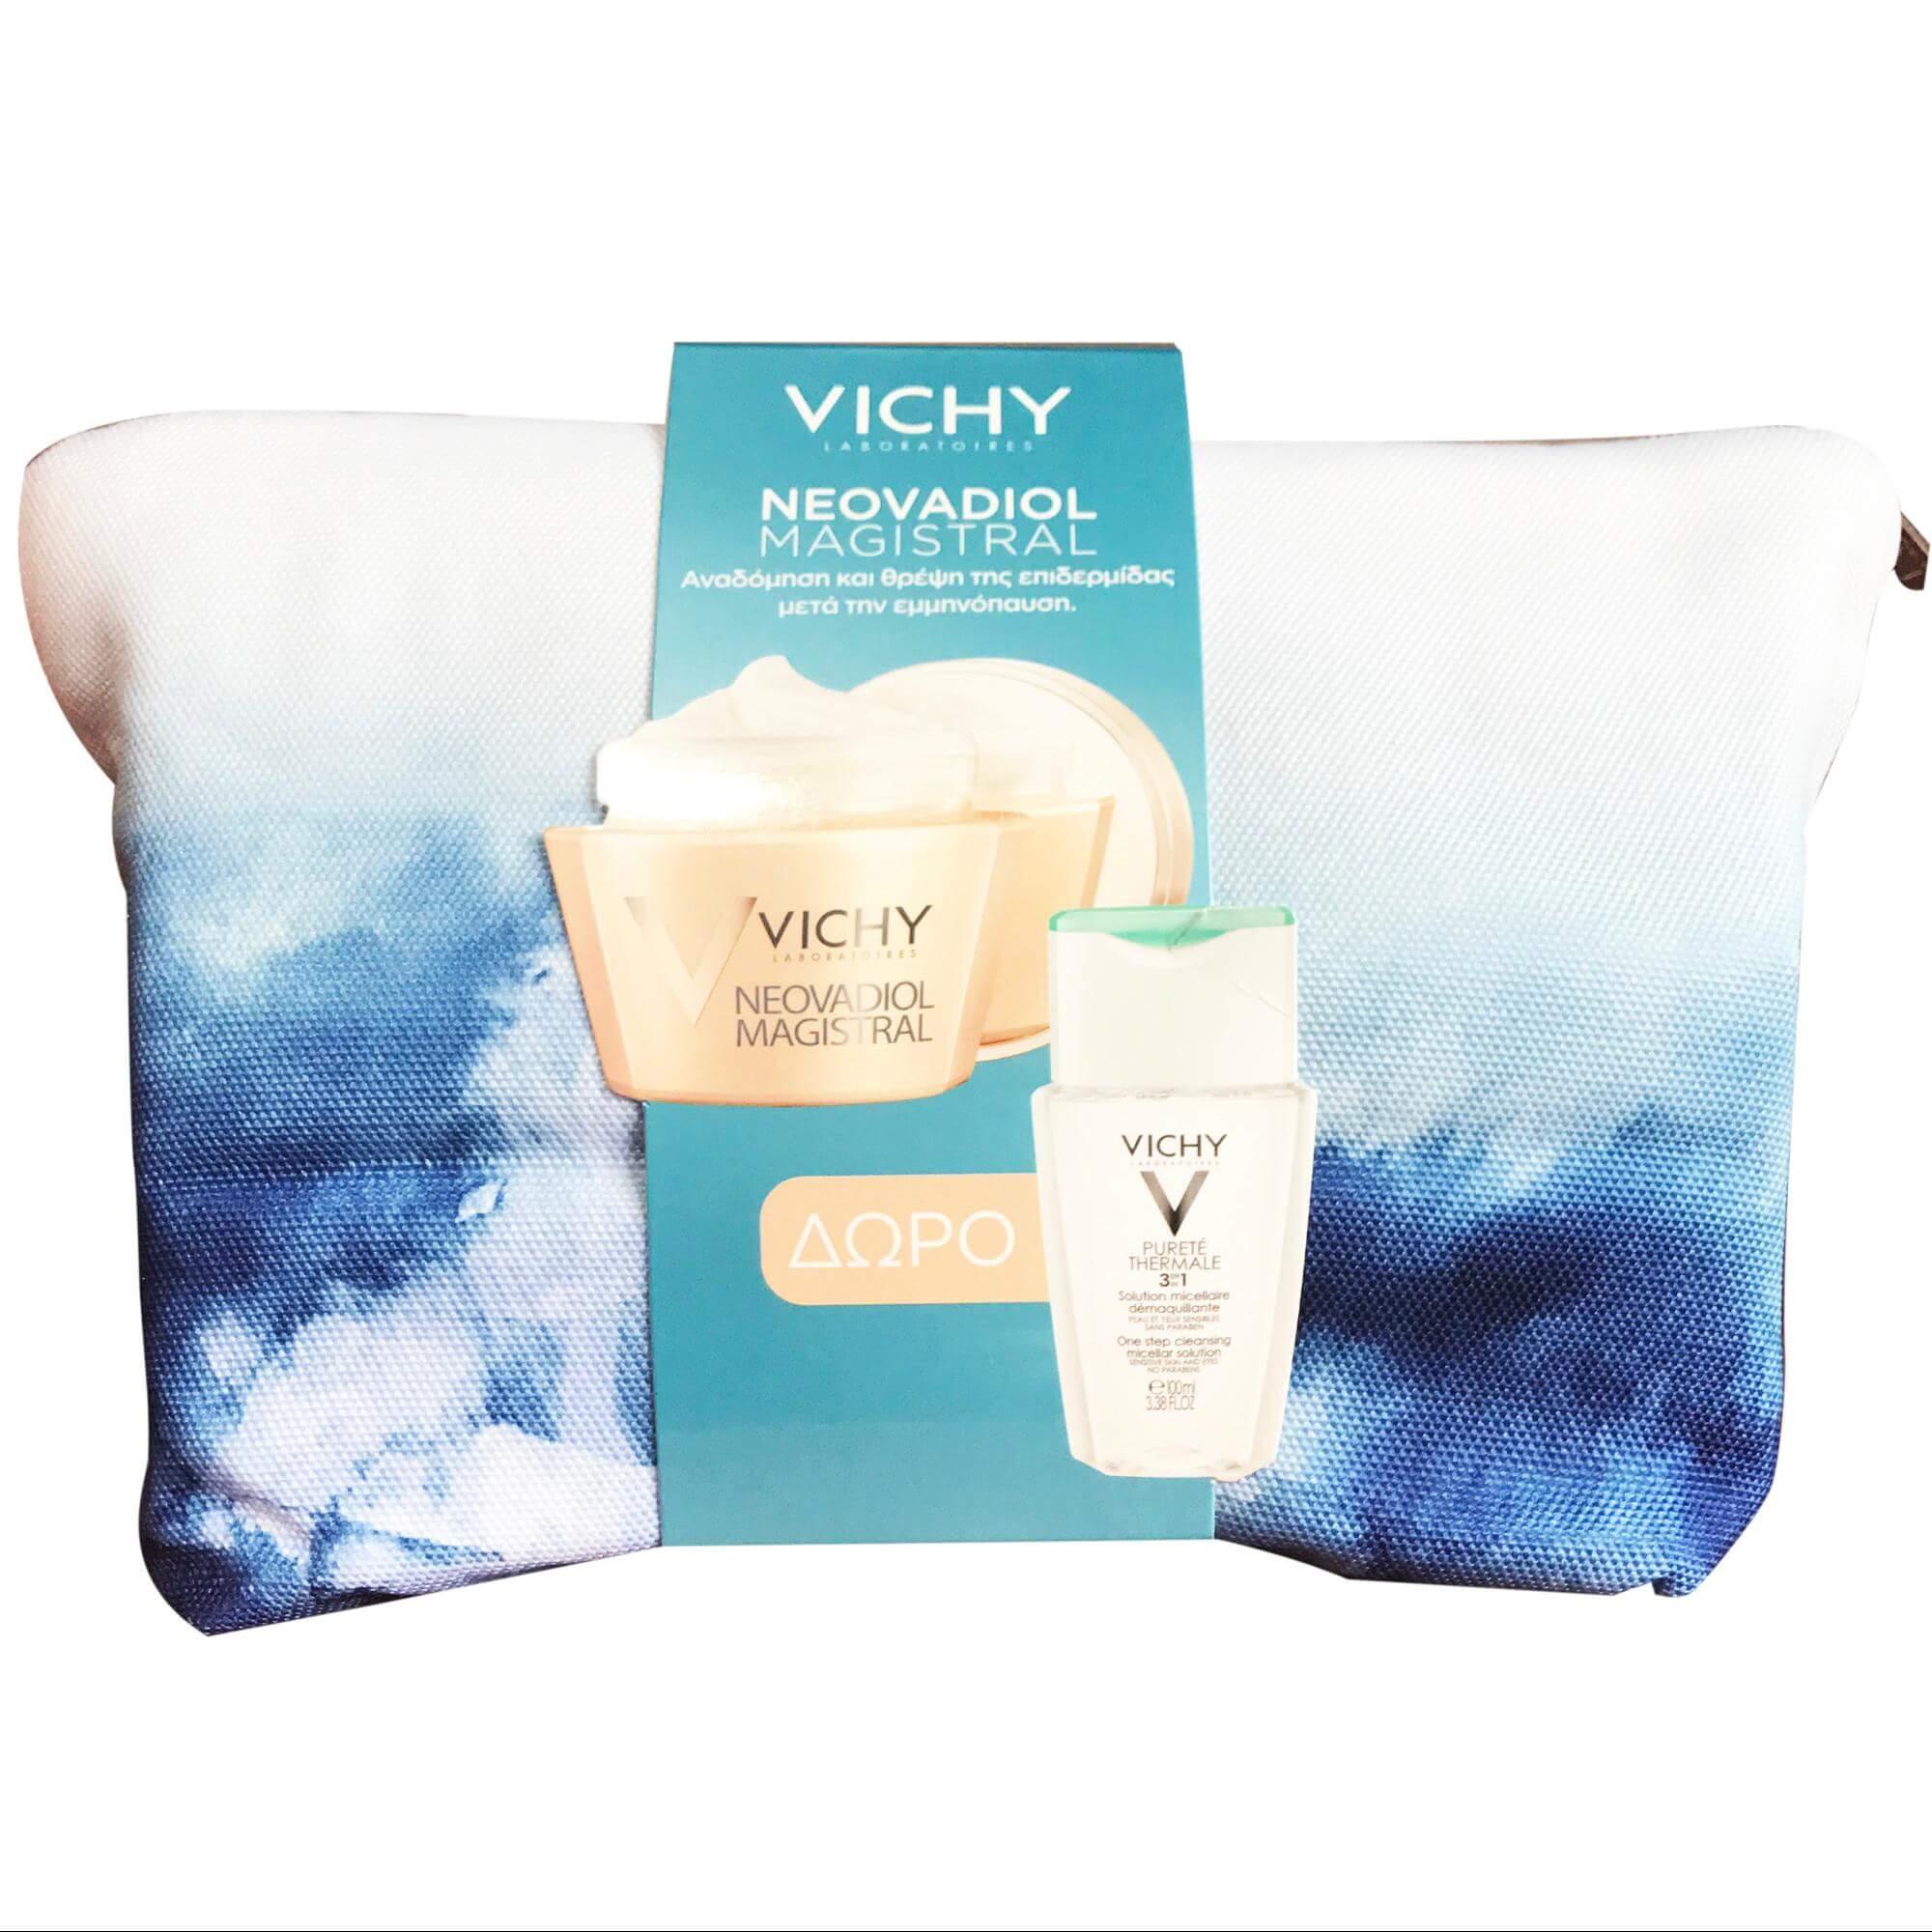 Vichy Πακέτο ΠροσφοράςNeovadiol Magistral 50ml & ΔώροPurete Thermale 3-in-1 100ml & Neovadiol Elixir 3ml